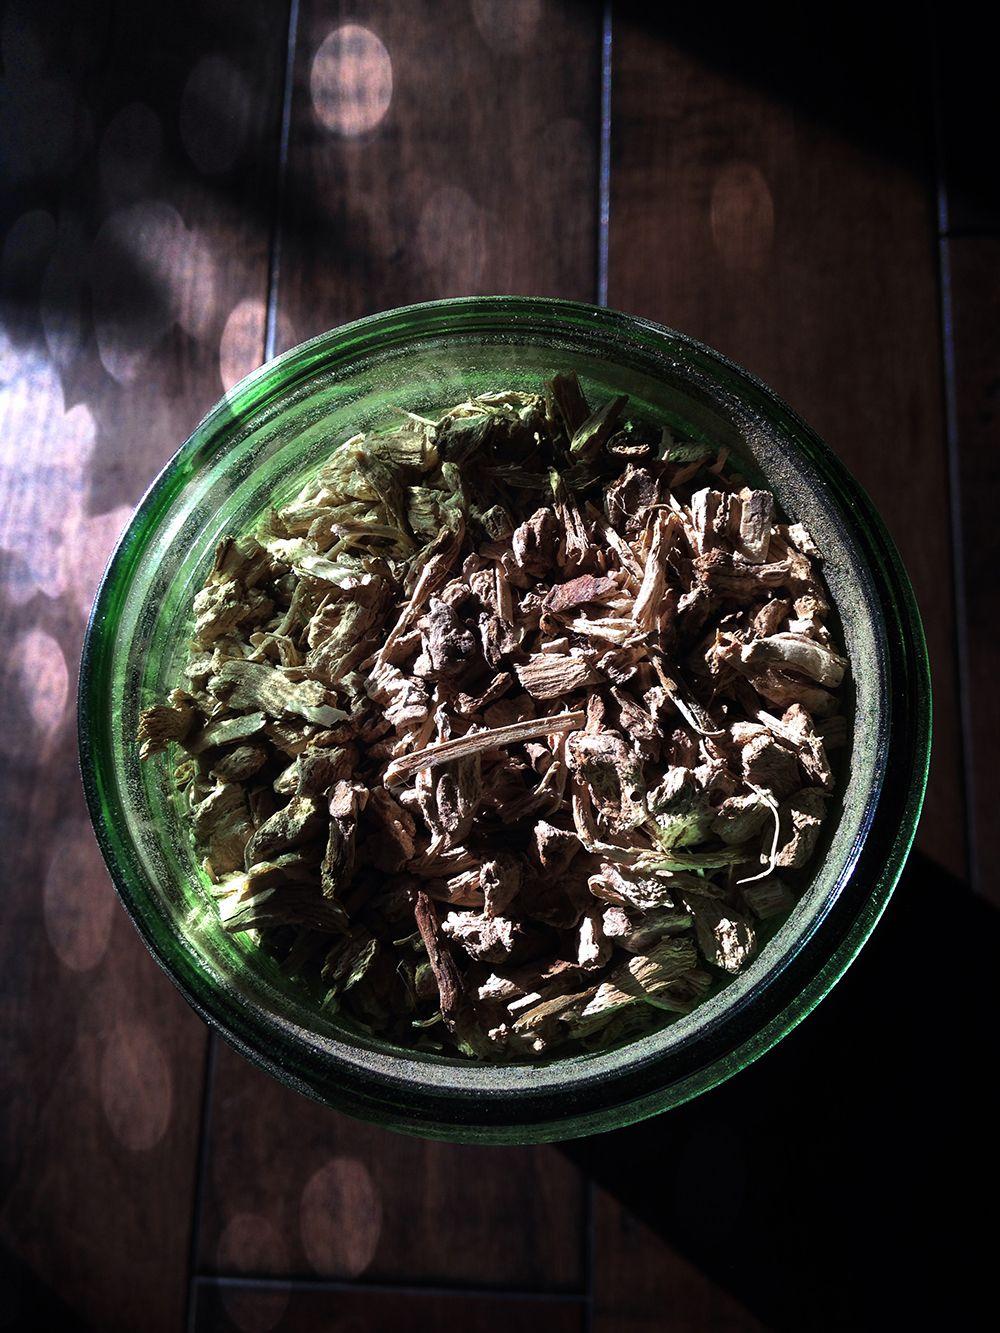 Belladonna-Opium